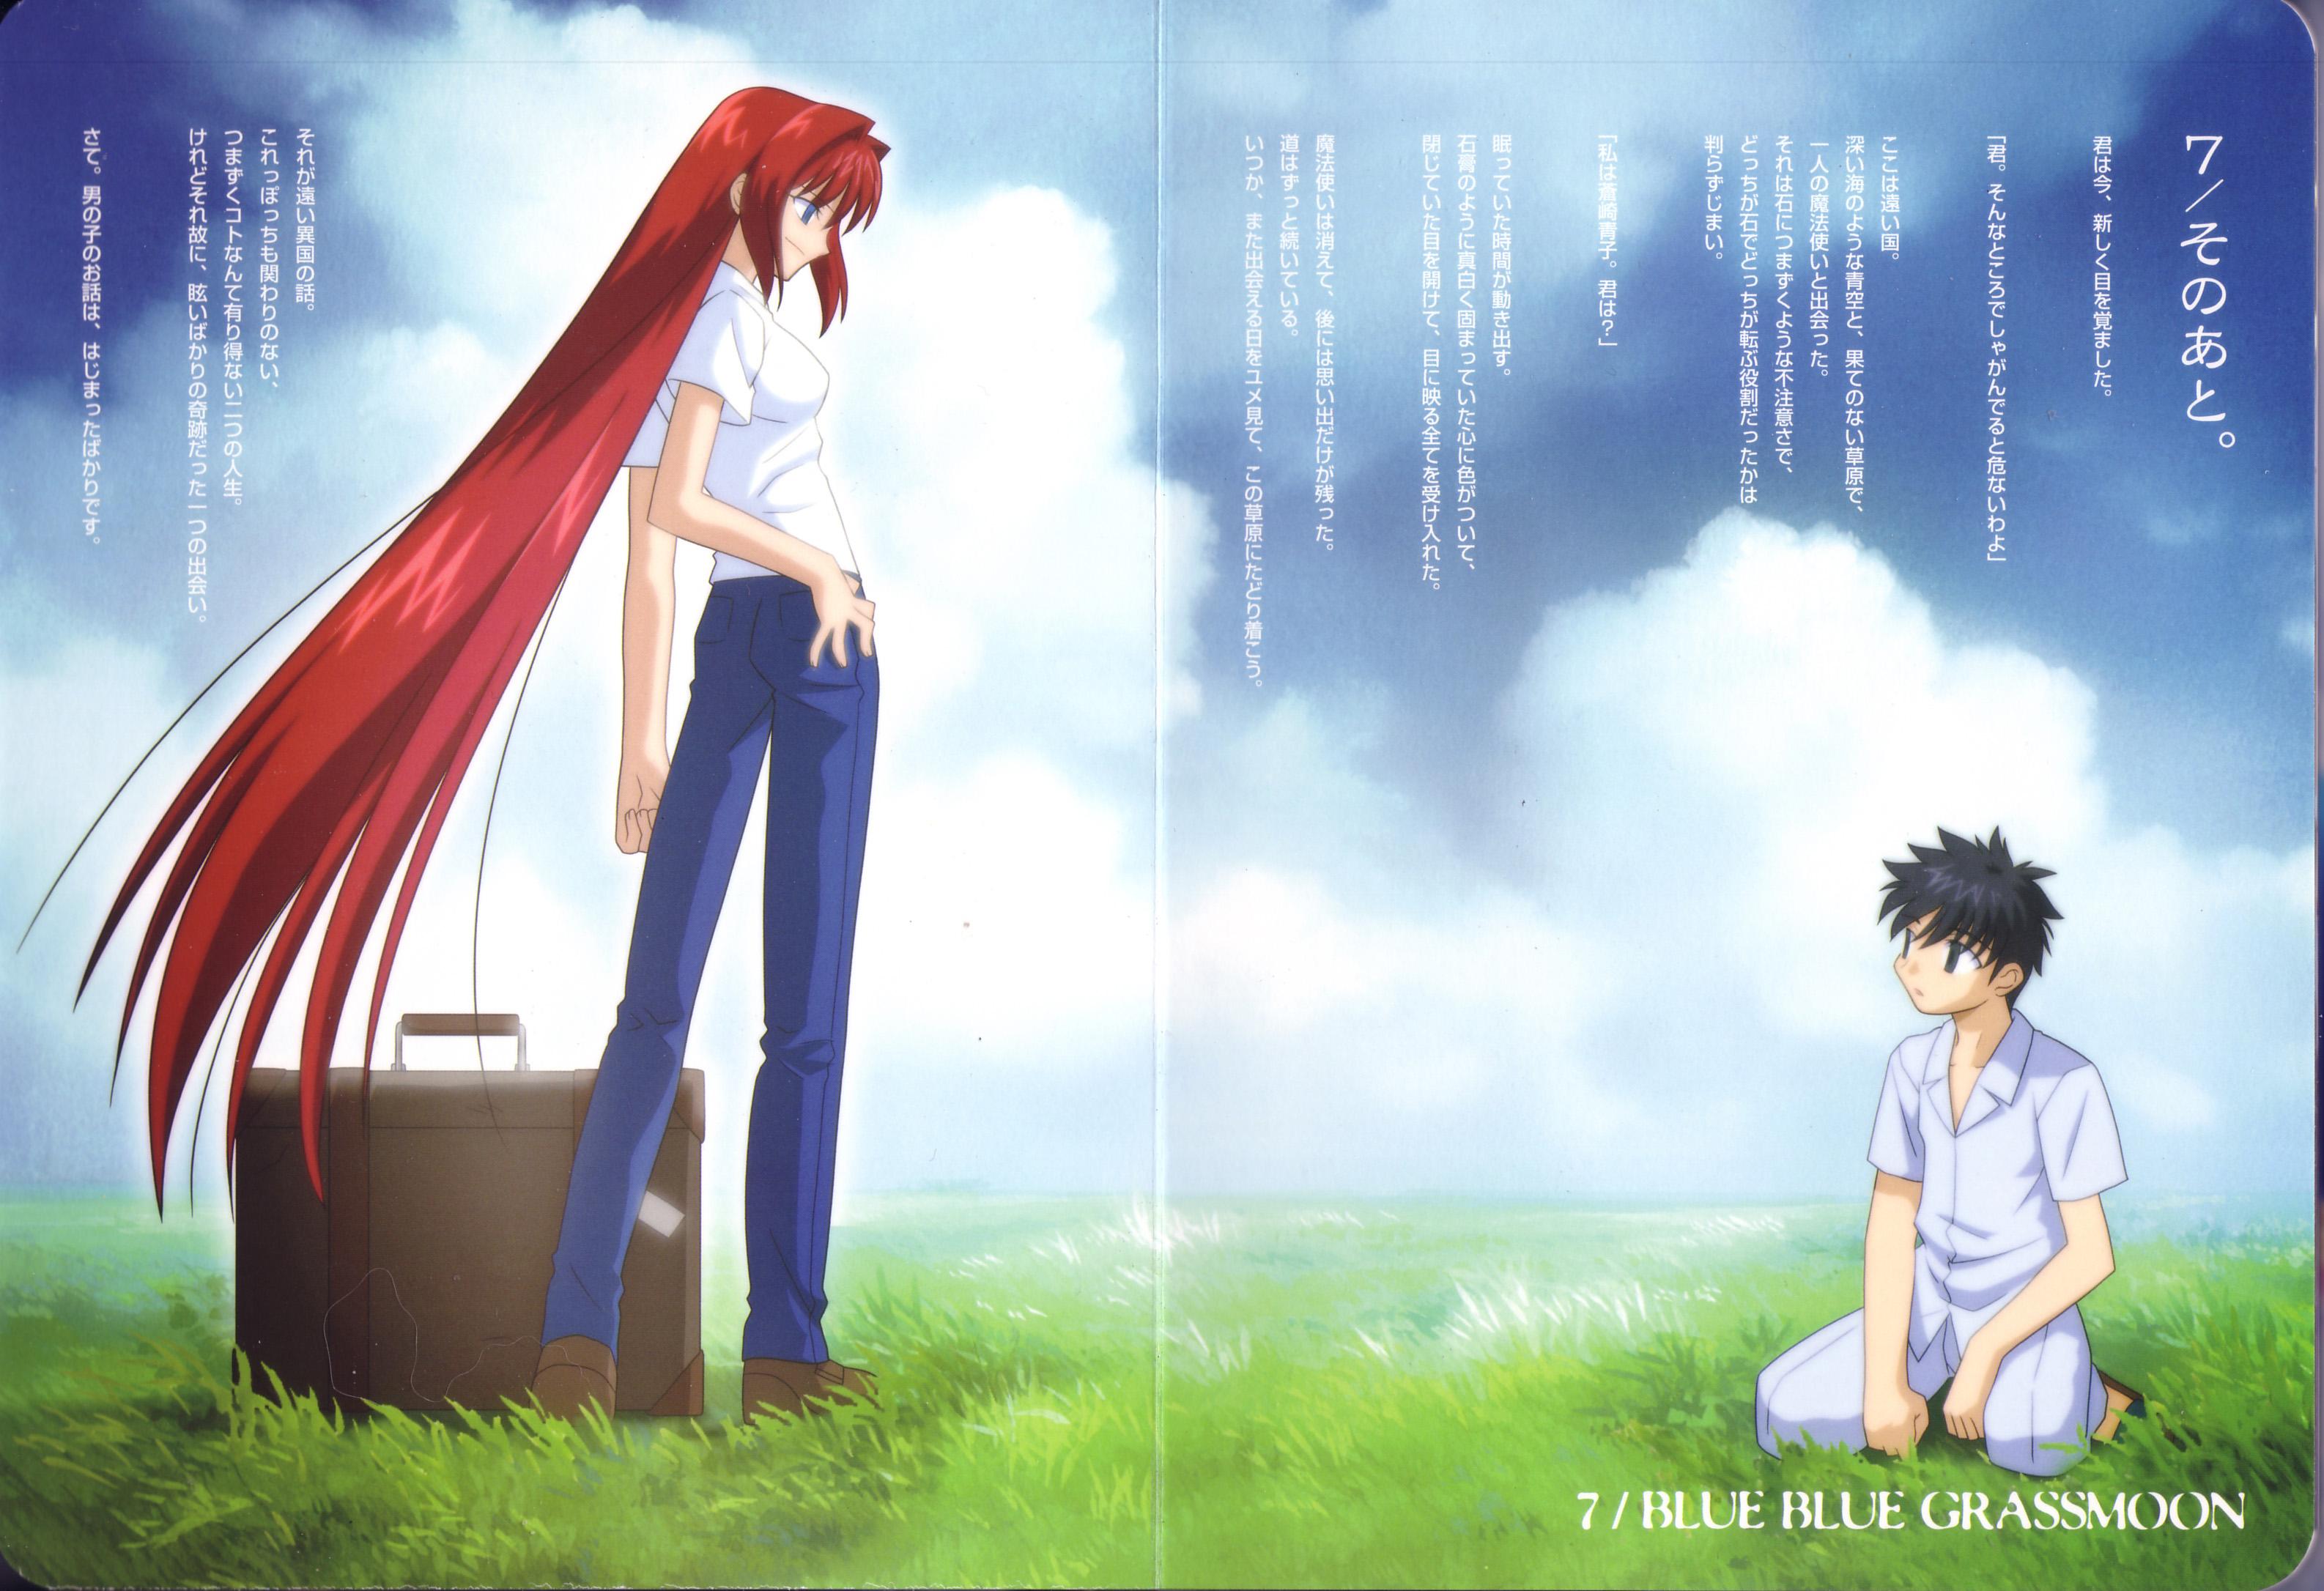 Dec 2017 Full Moon >> Tsukihime (Lunar Legend Moon Princess) Image #903799 - Zerochan Anime Image Board